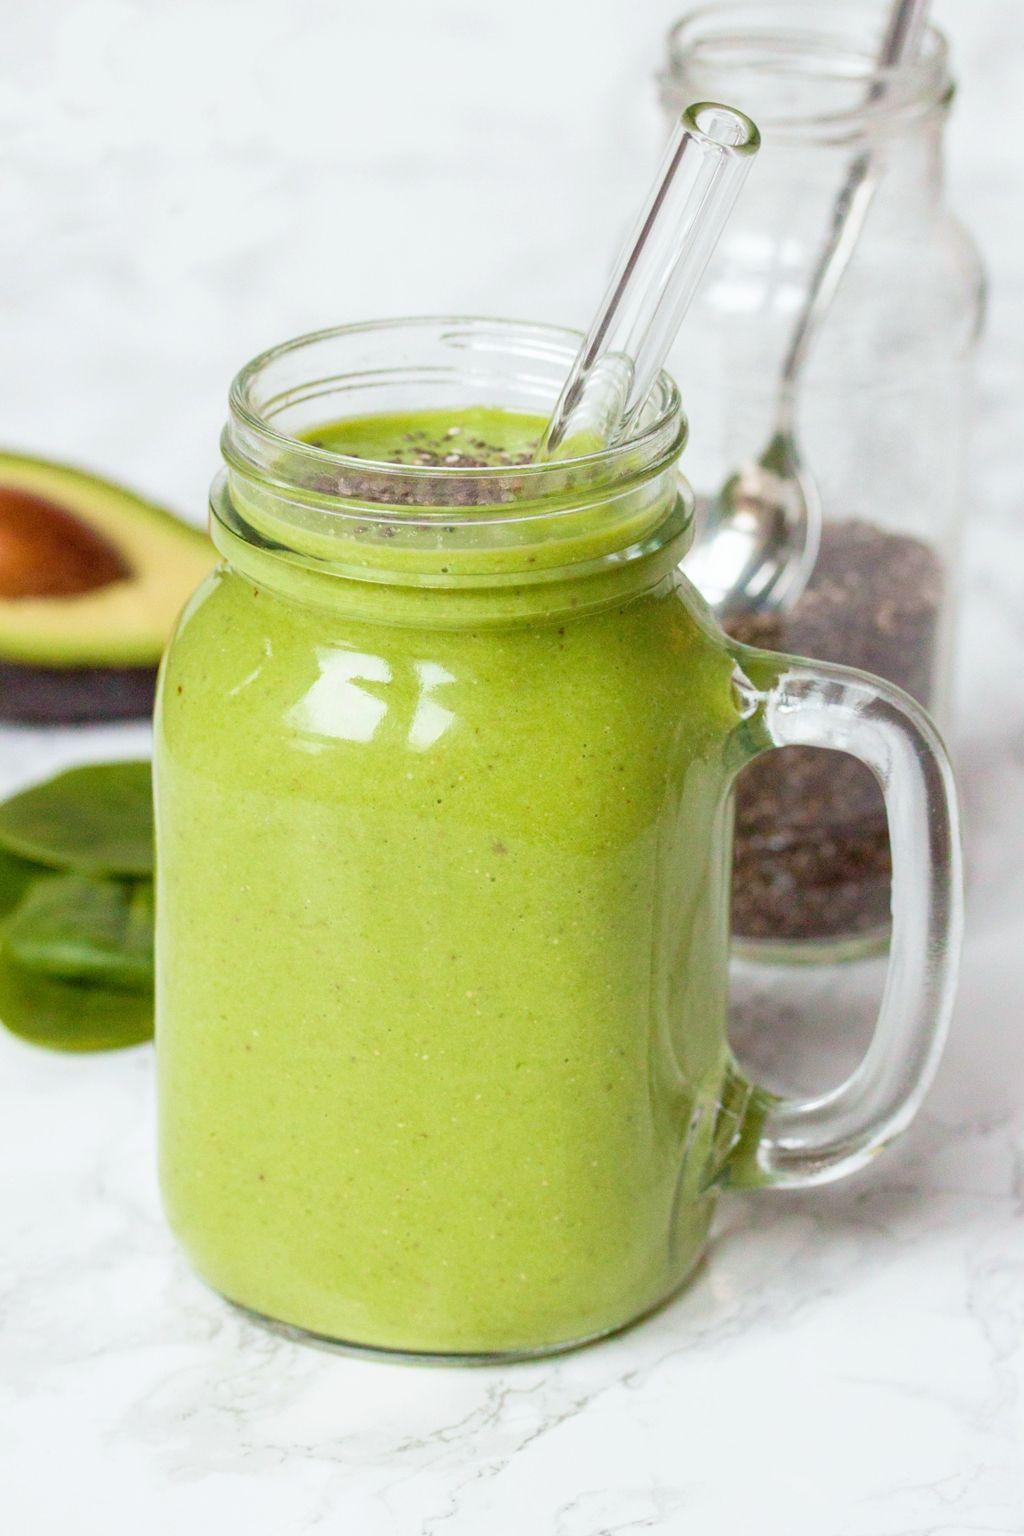 Green Avocado Smoothie With Chia Seeds Recipe Chia Seed Smoothie Avocado Smoothie Easy Green Smoothie